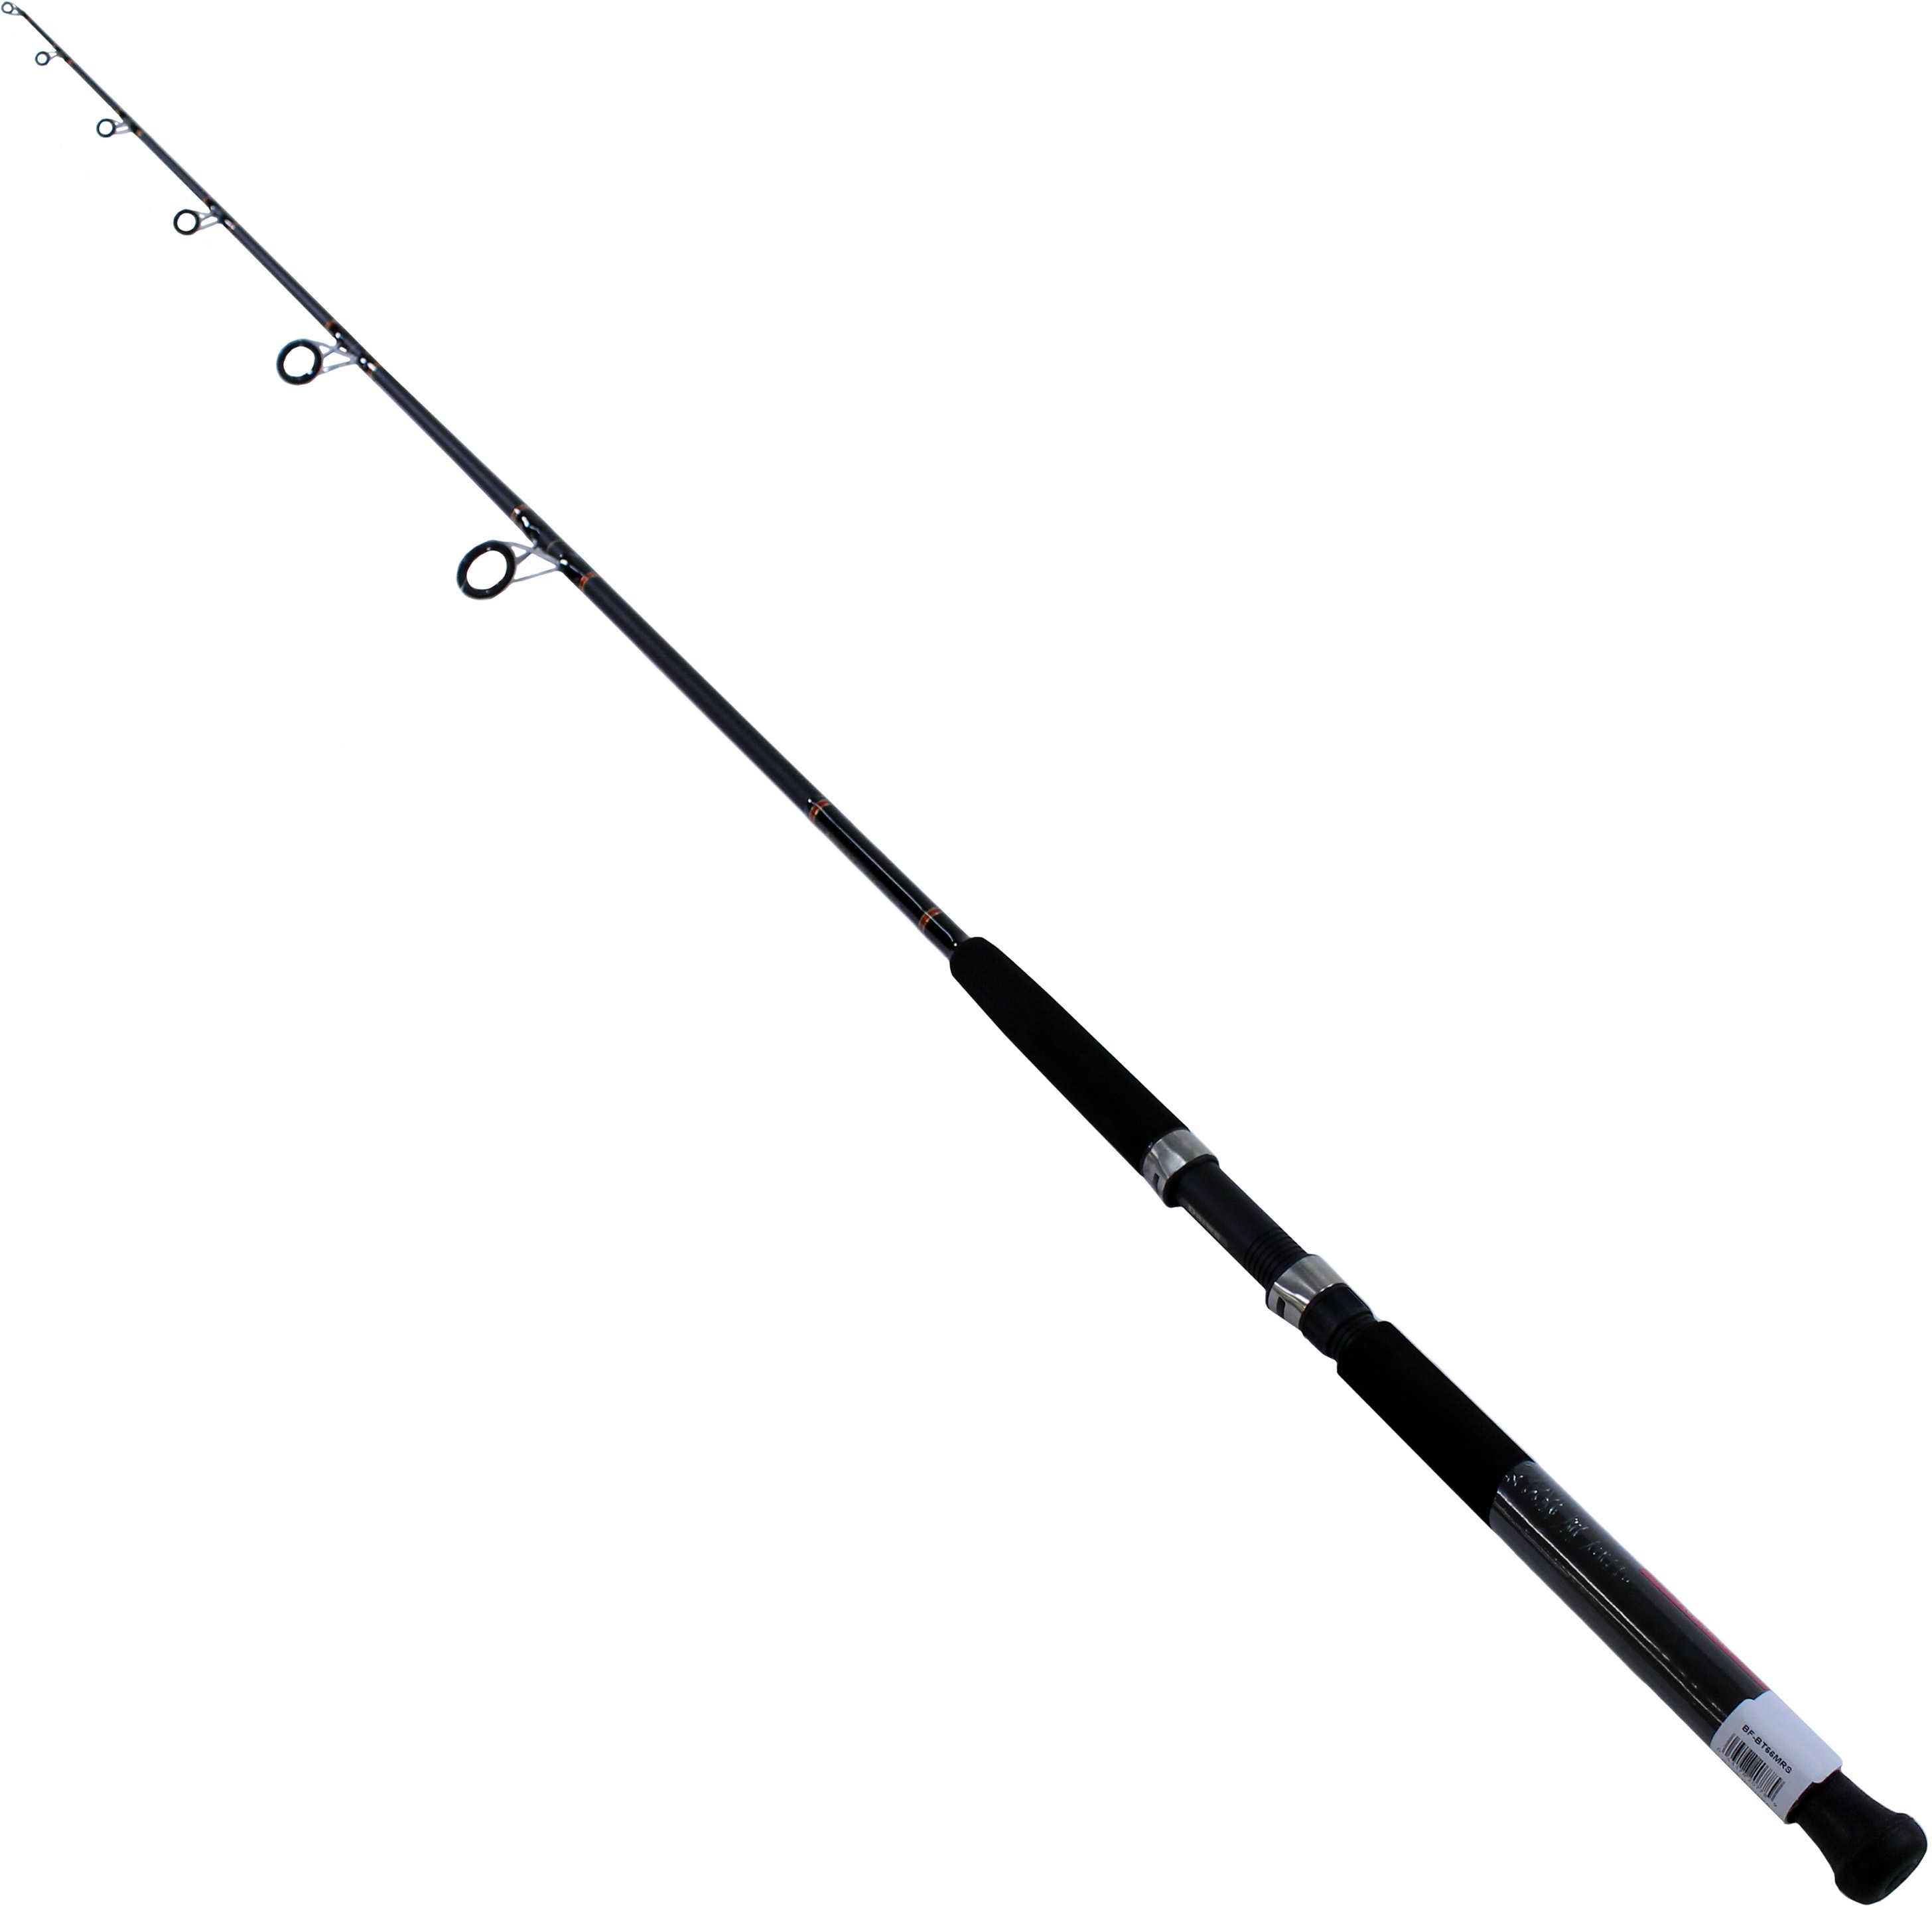 "Daiwa Beefstick BT Saltwater Boat Rod Spinning, 6'6"" Md: Spinning Rod BFBT66MRS"